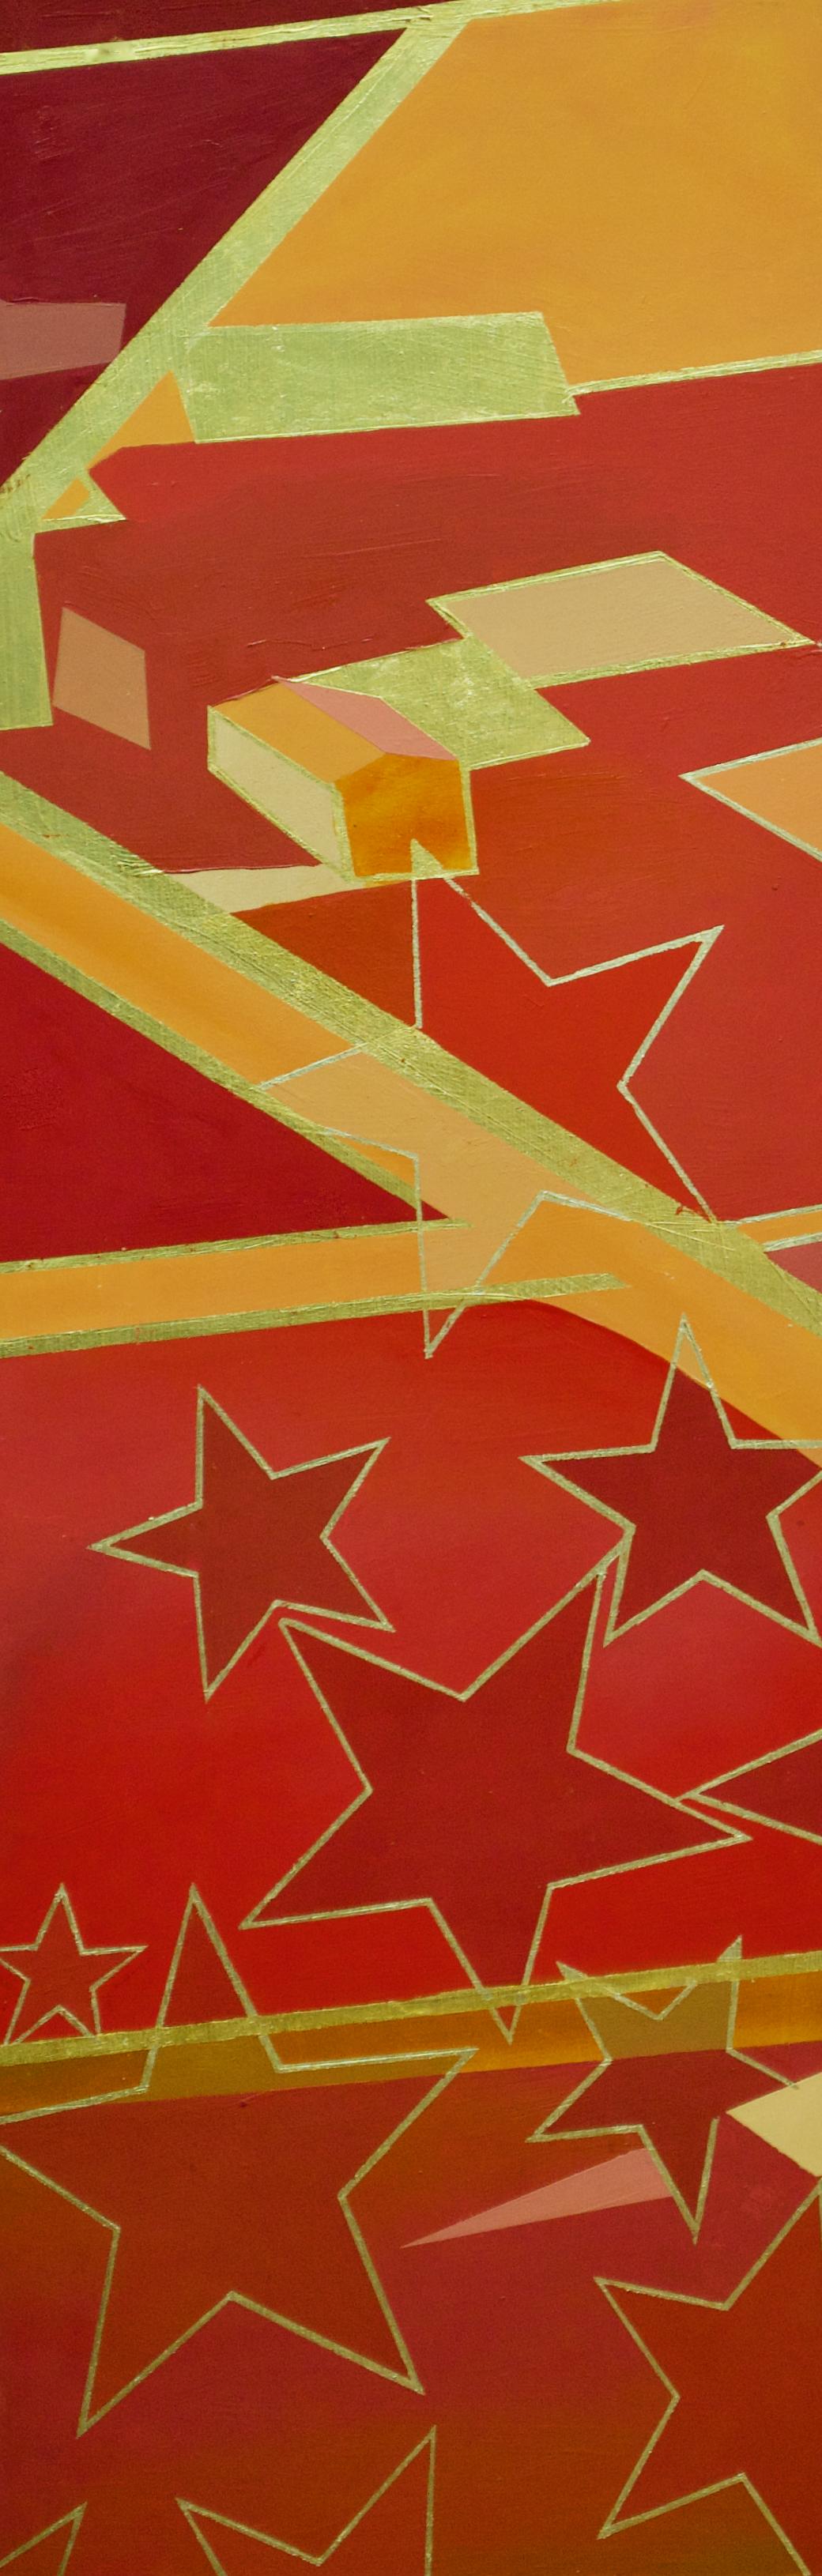 "Wonderwheel #16 - 30"" x 10"" oil and gold leaf on panel$975"